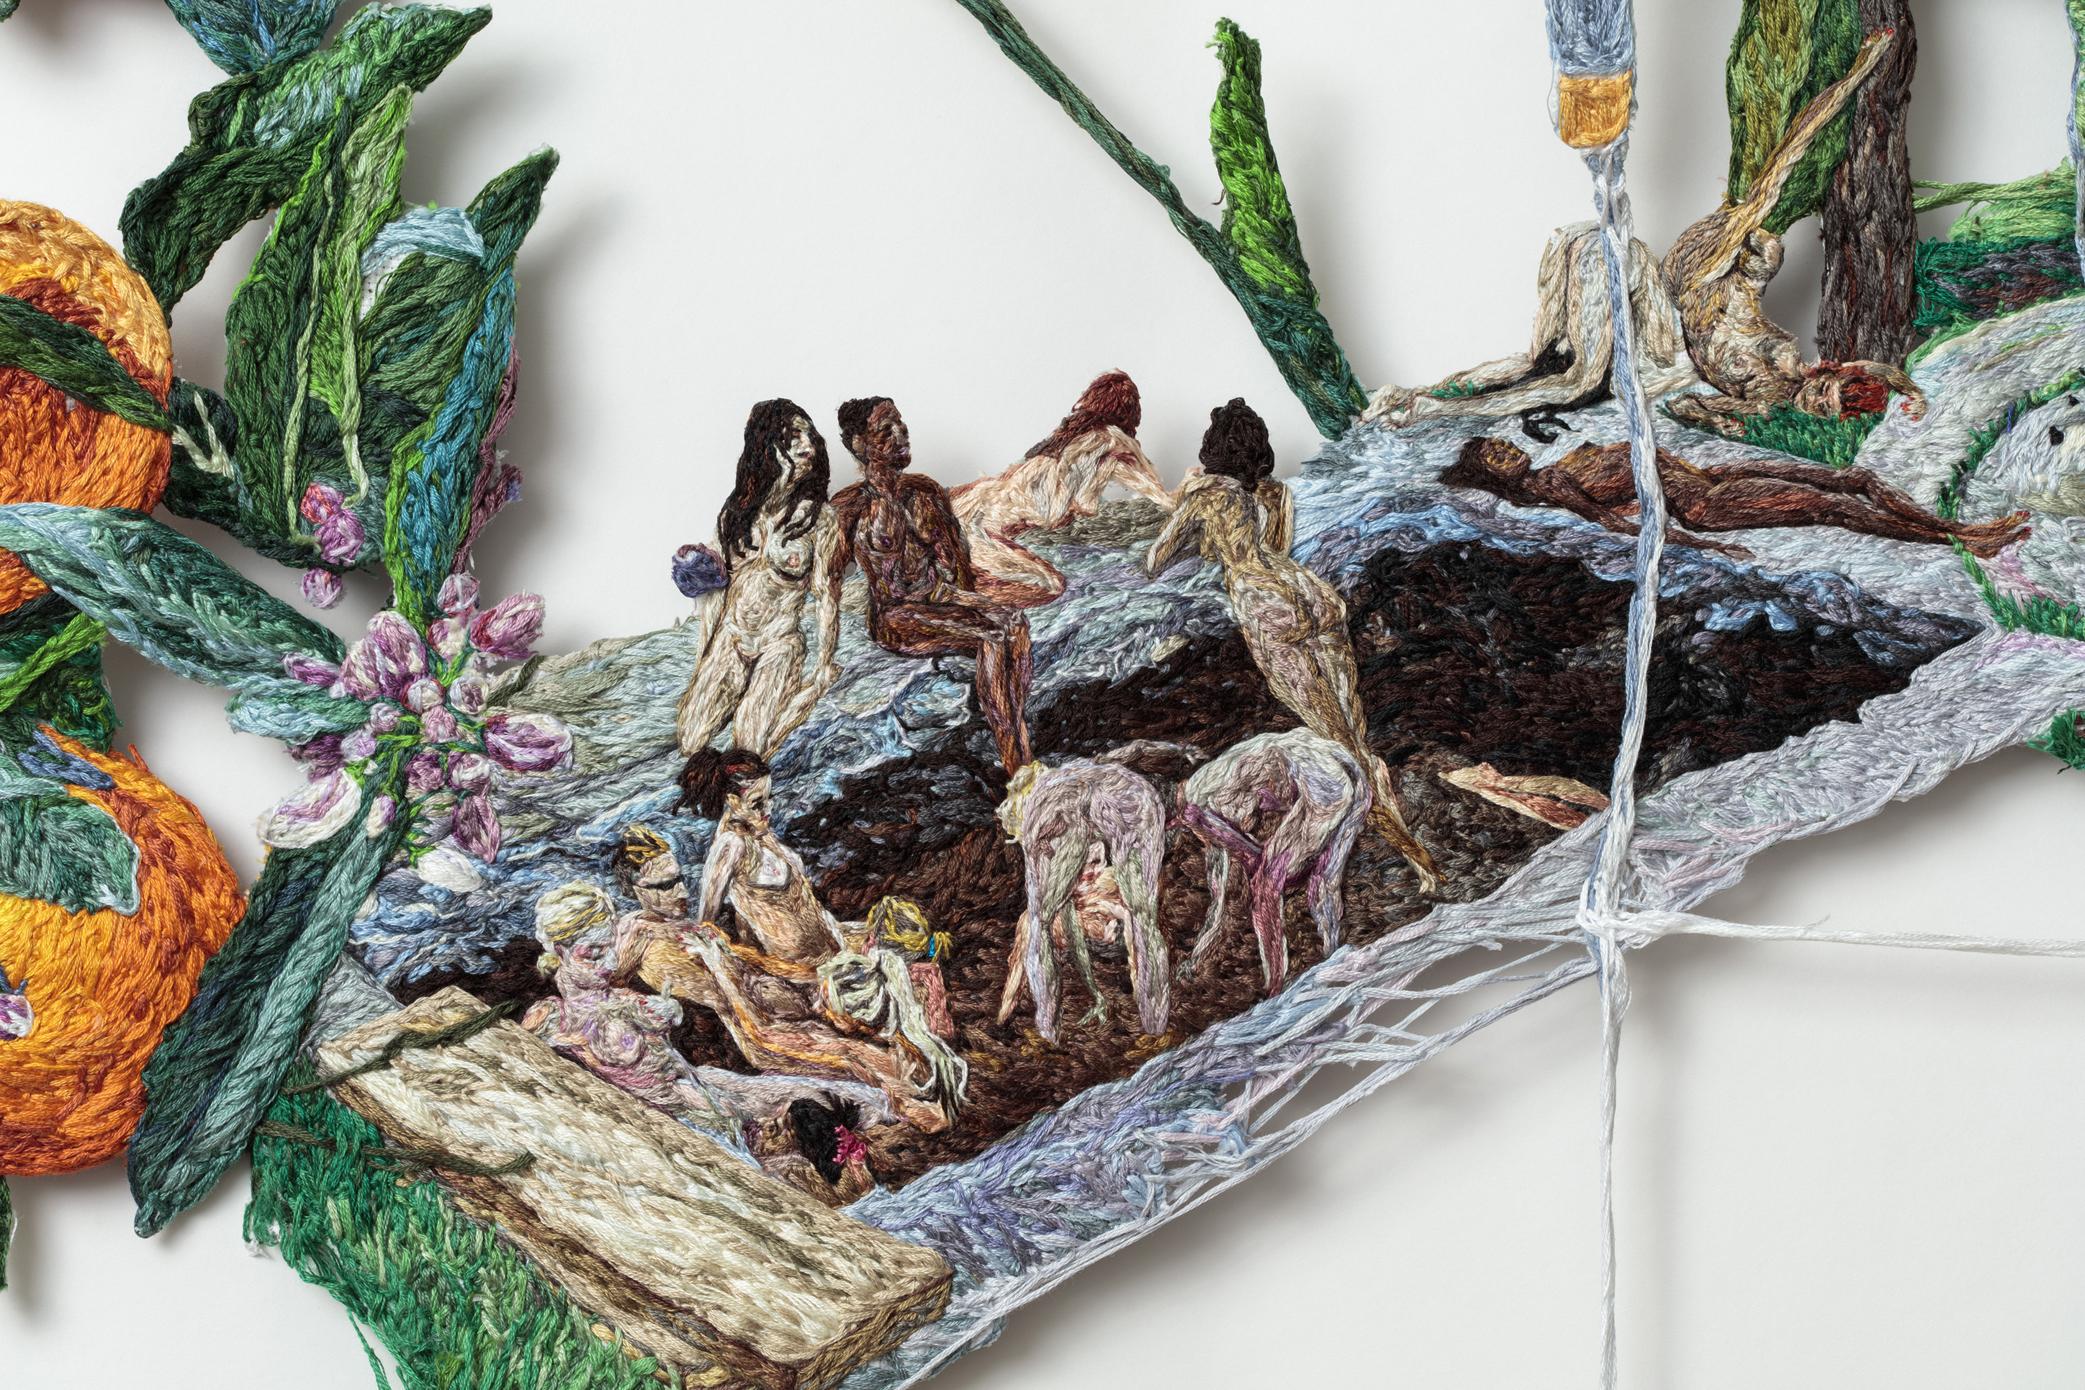 07. Stuck (detail 3), Sophia Narrett, 2016, Embroidery Thread and Fabric,.jpg